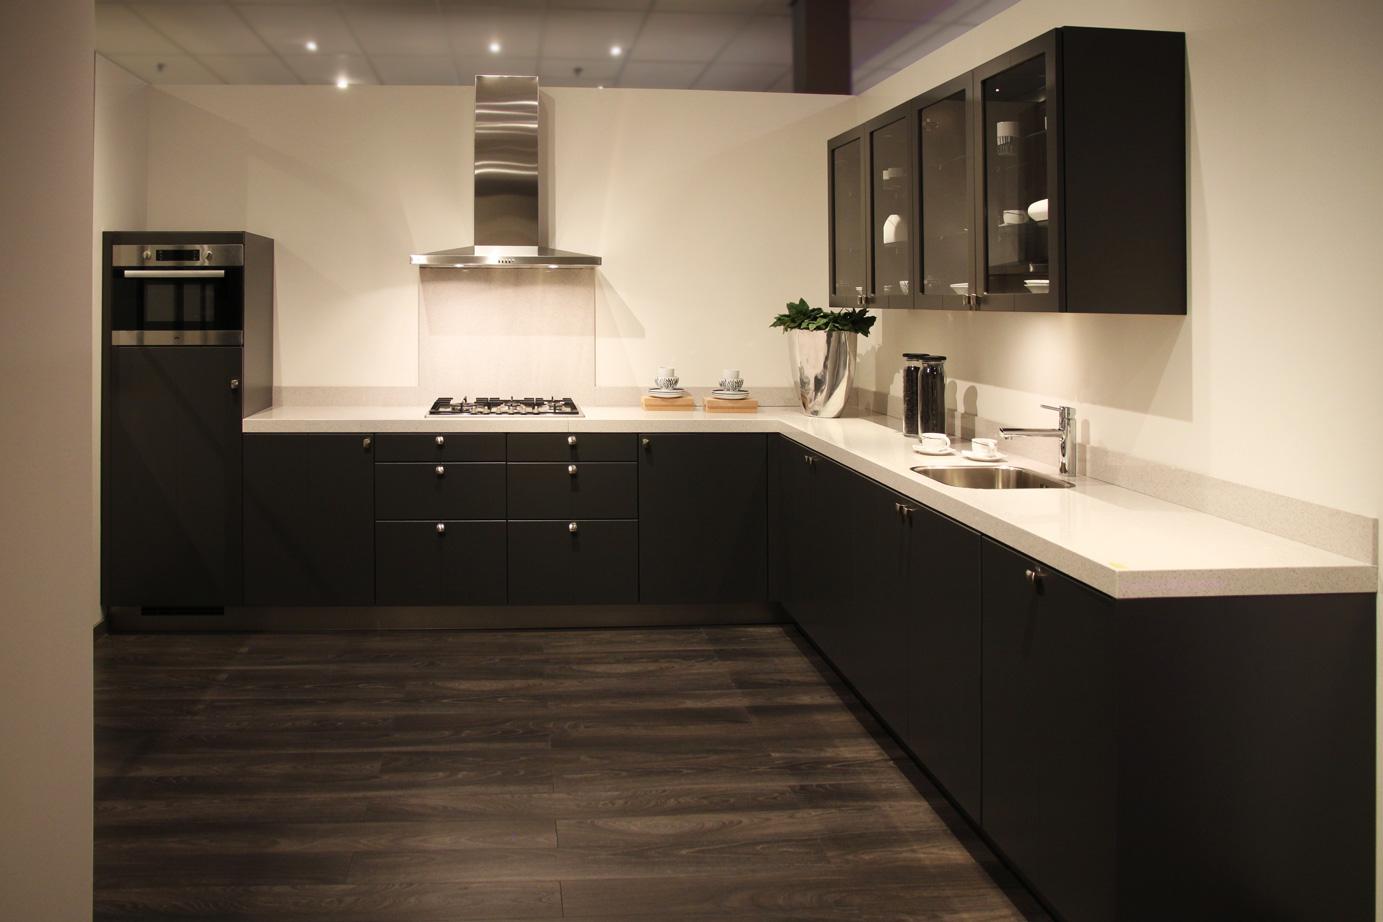 Nieuwe Badkamer Rotterdam ~   Keukens Schitterende tegels ten hove keukens badkamers Keukens